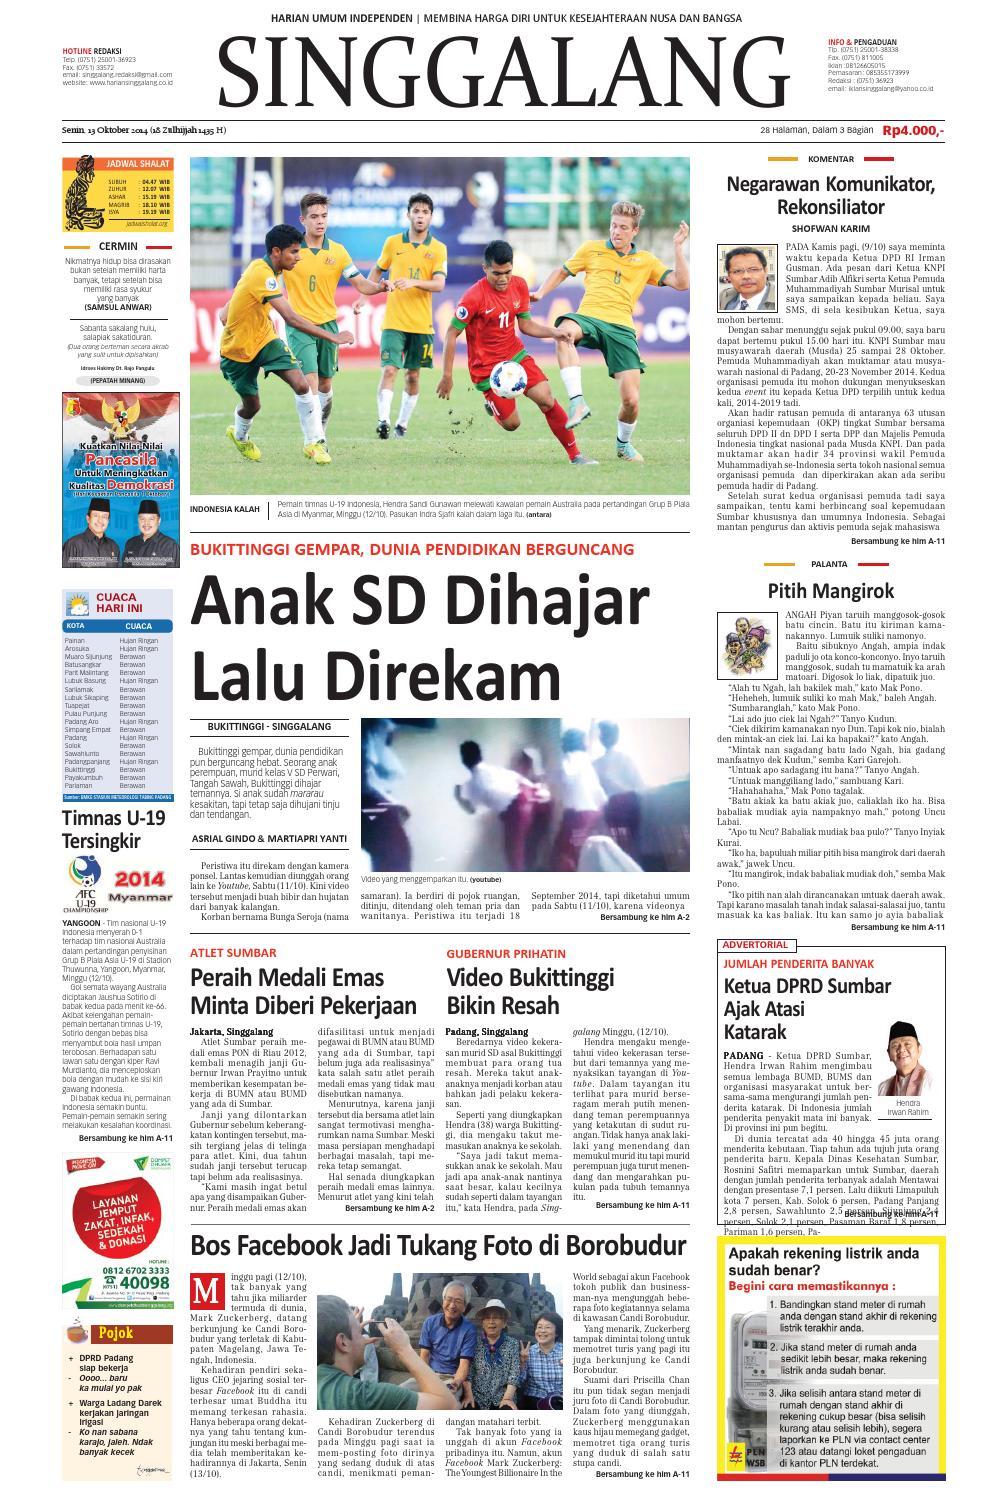 Harian Singgalang Senin 13 Oktober By Issuu Produk Ukm Bumn Tenun Pagatan Kemeja Pria Biru Kapal